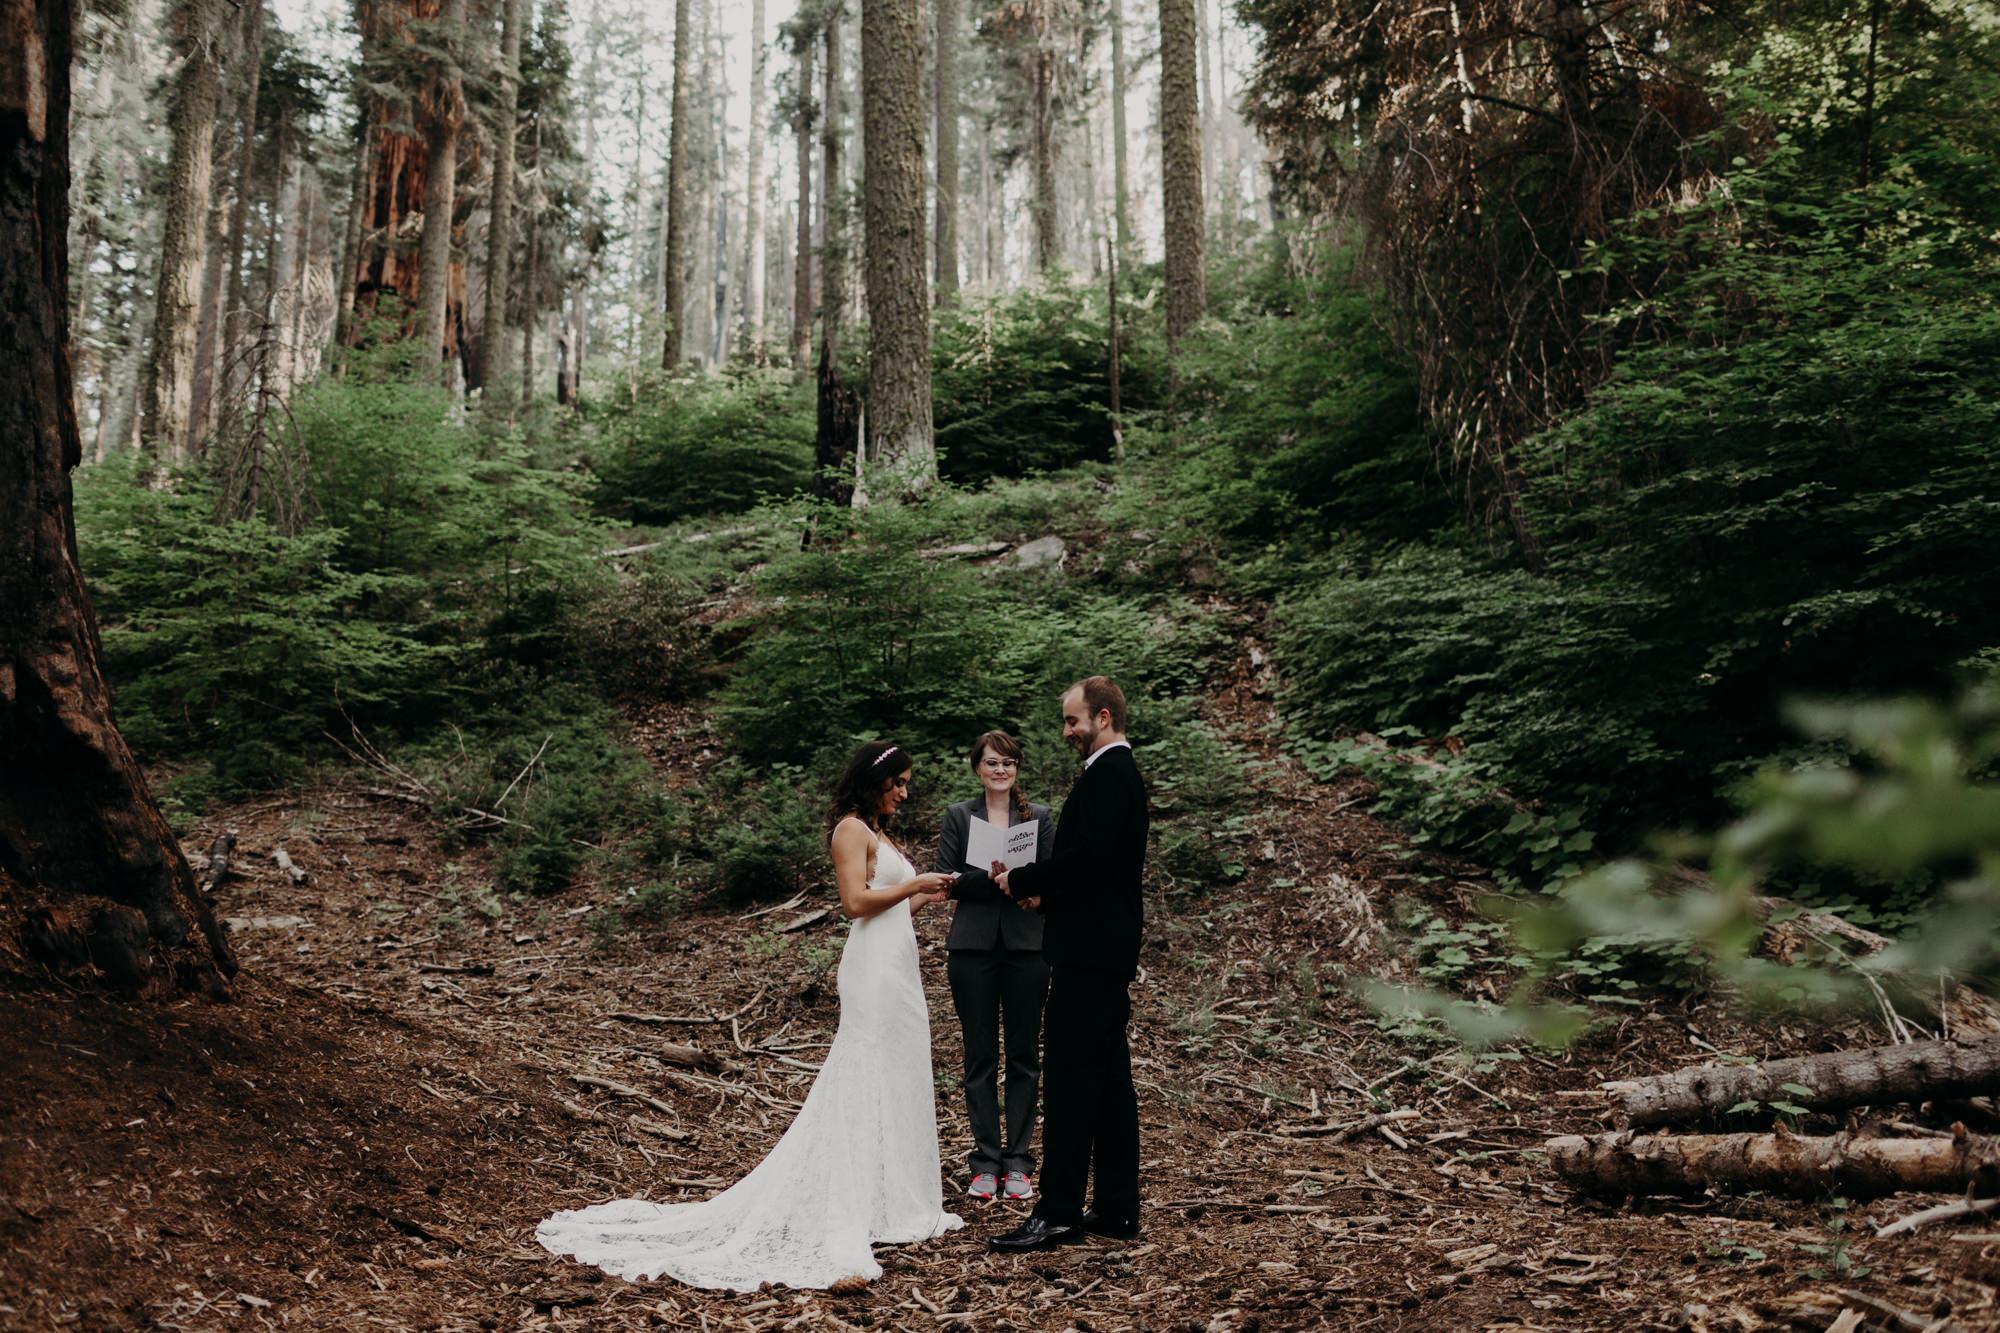 sequoia national park elopement-3.jpg